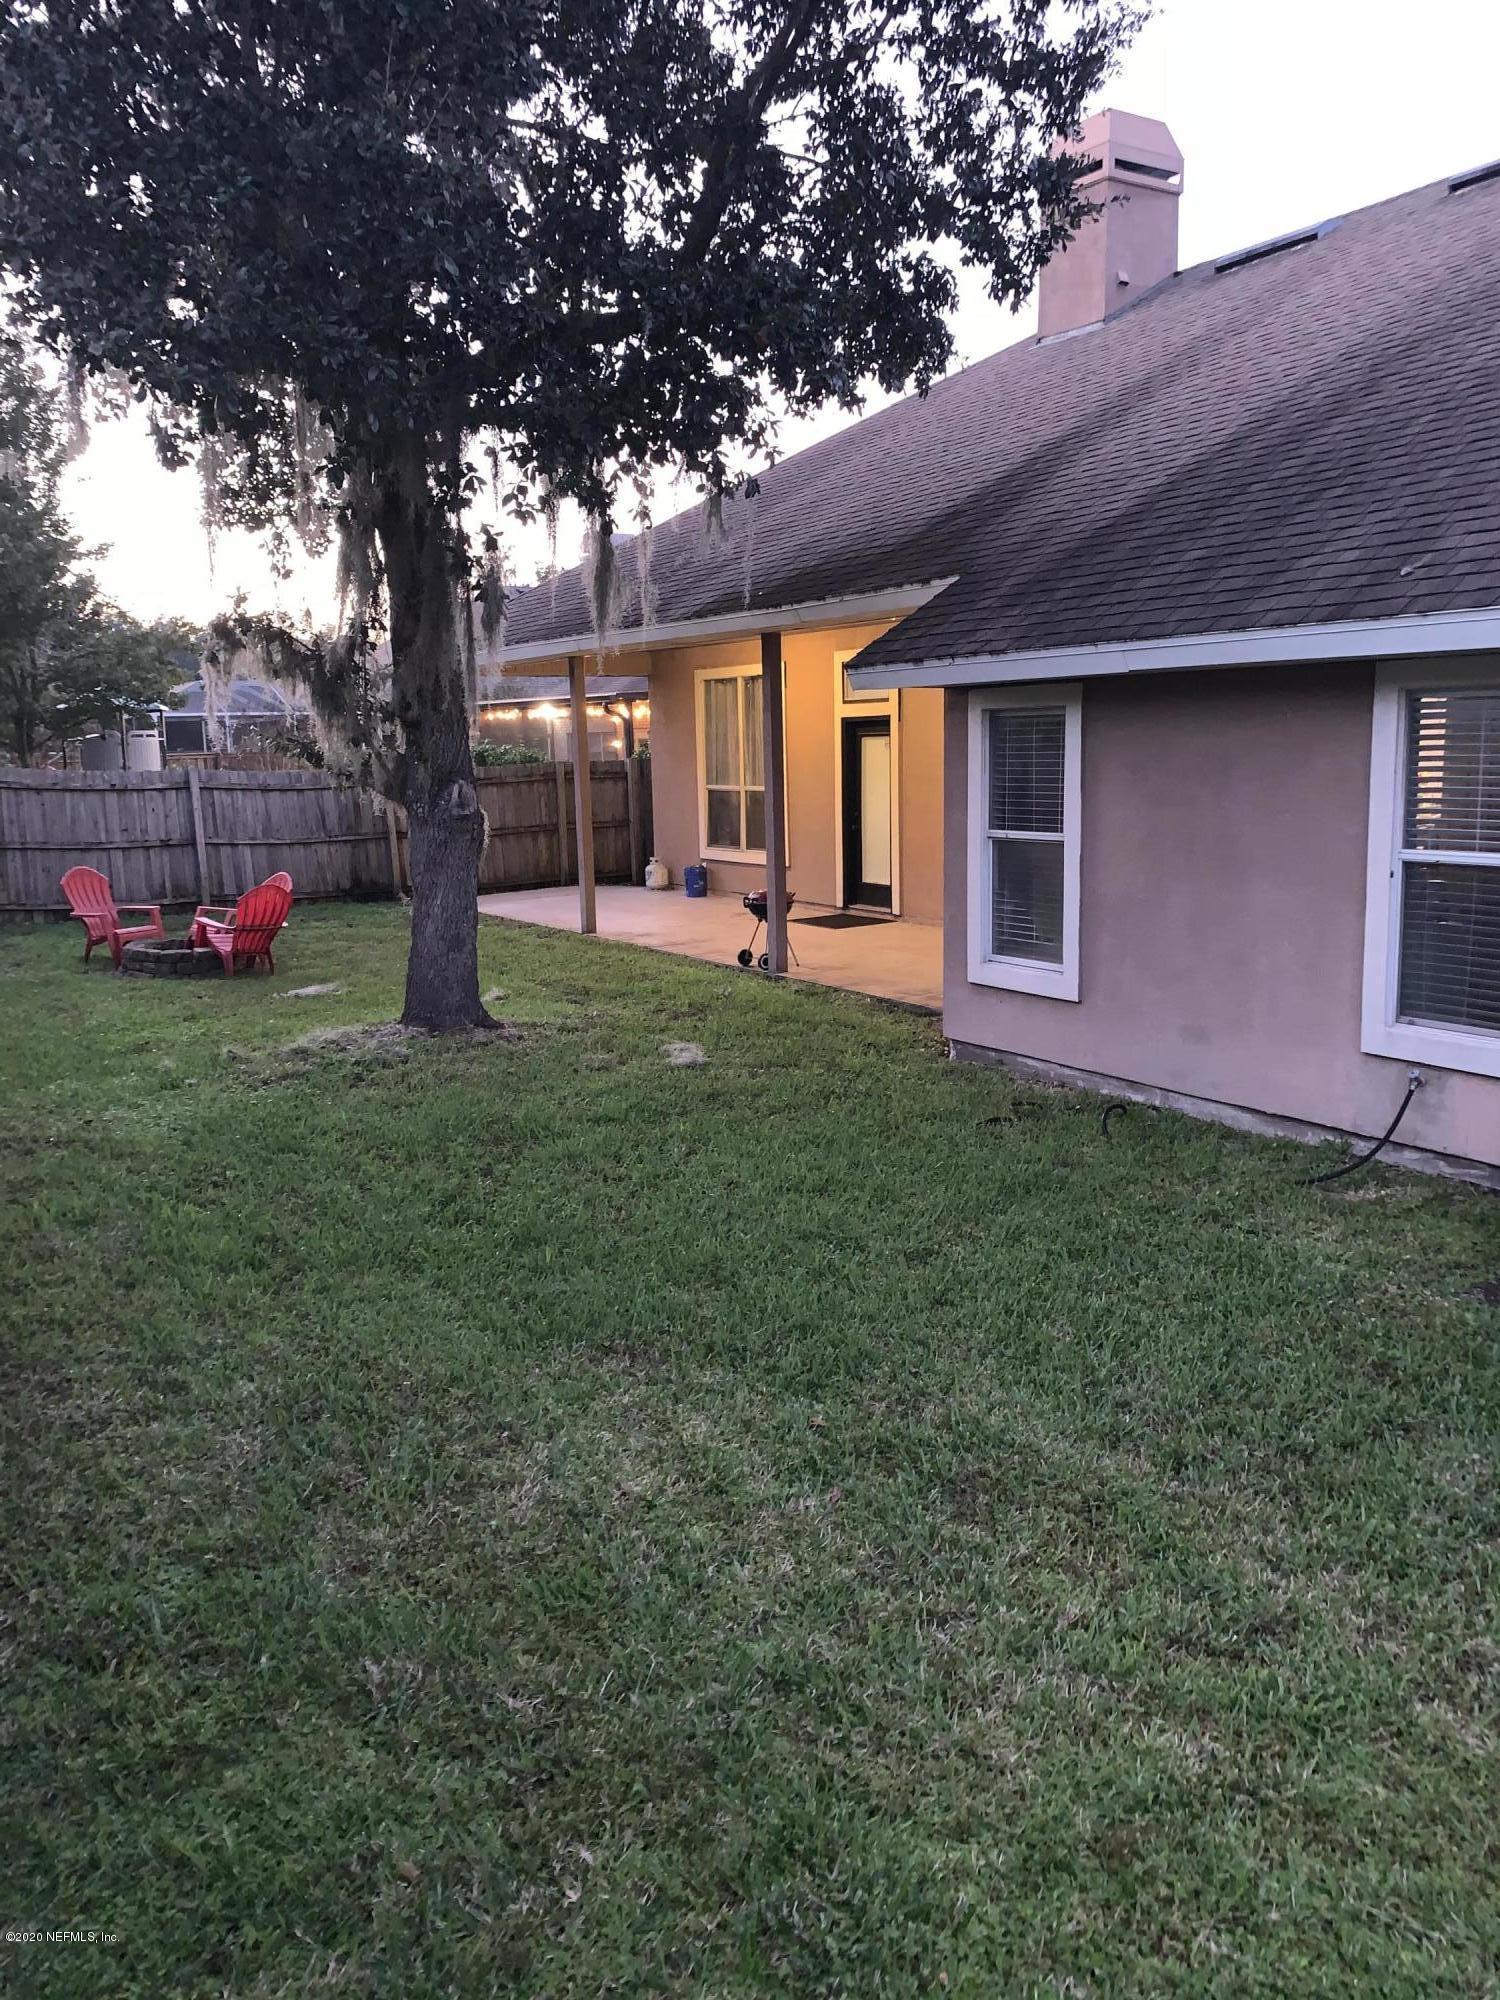 11610 SUMMER BROOK, JACKSONVILLE, FLORIDA 32258, 4 Bedrooms Bedrooms, ,2 BathroomsBathrooms,Residential,For sale,SUMMER BROOK,1082699